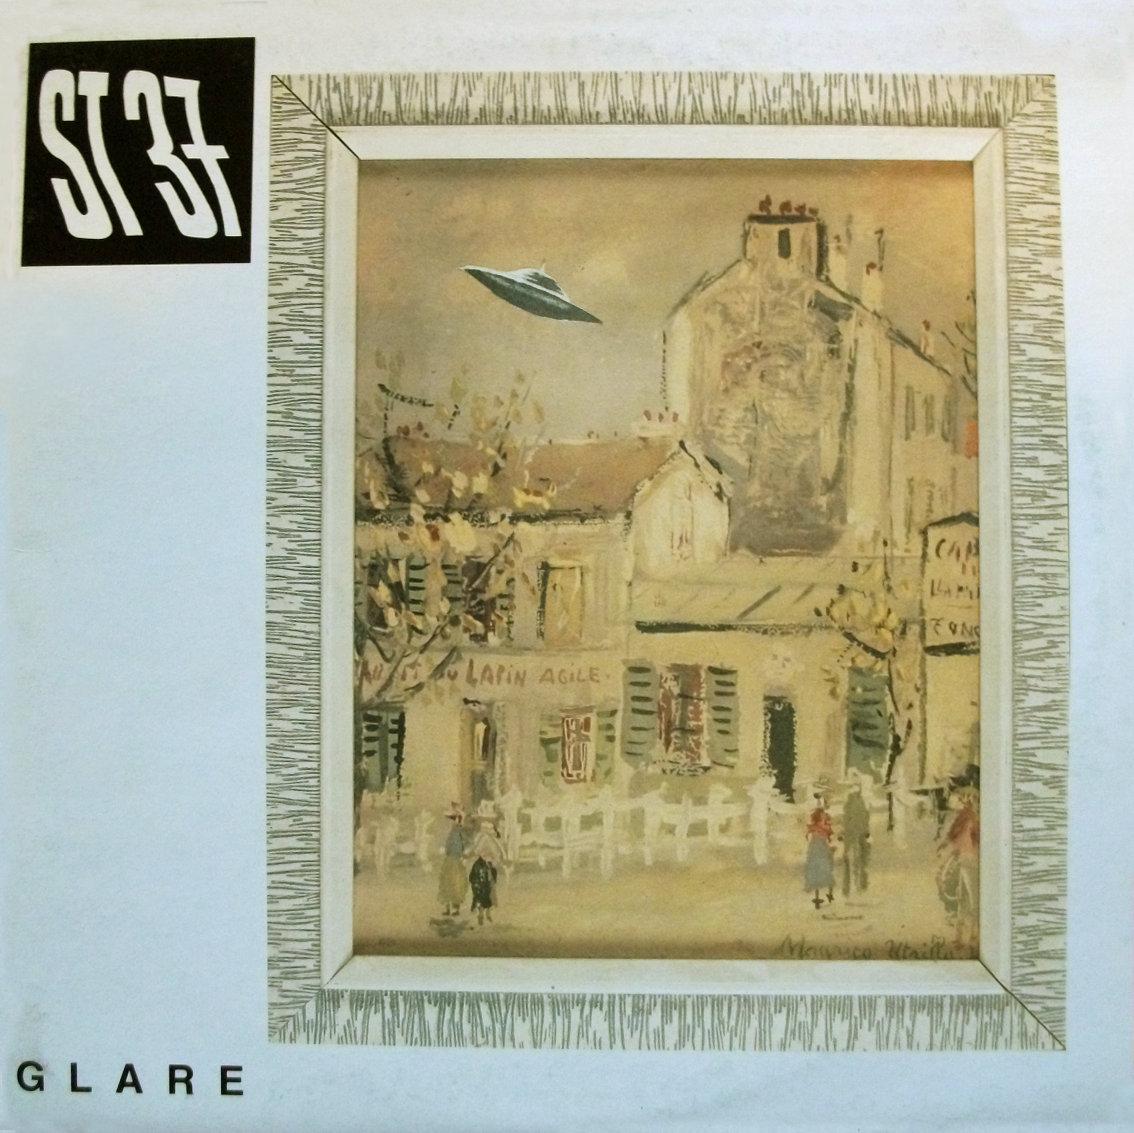 ST 37 — Glare